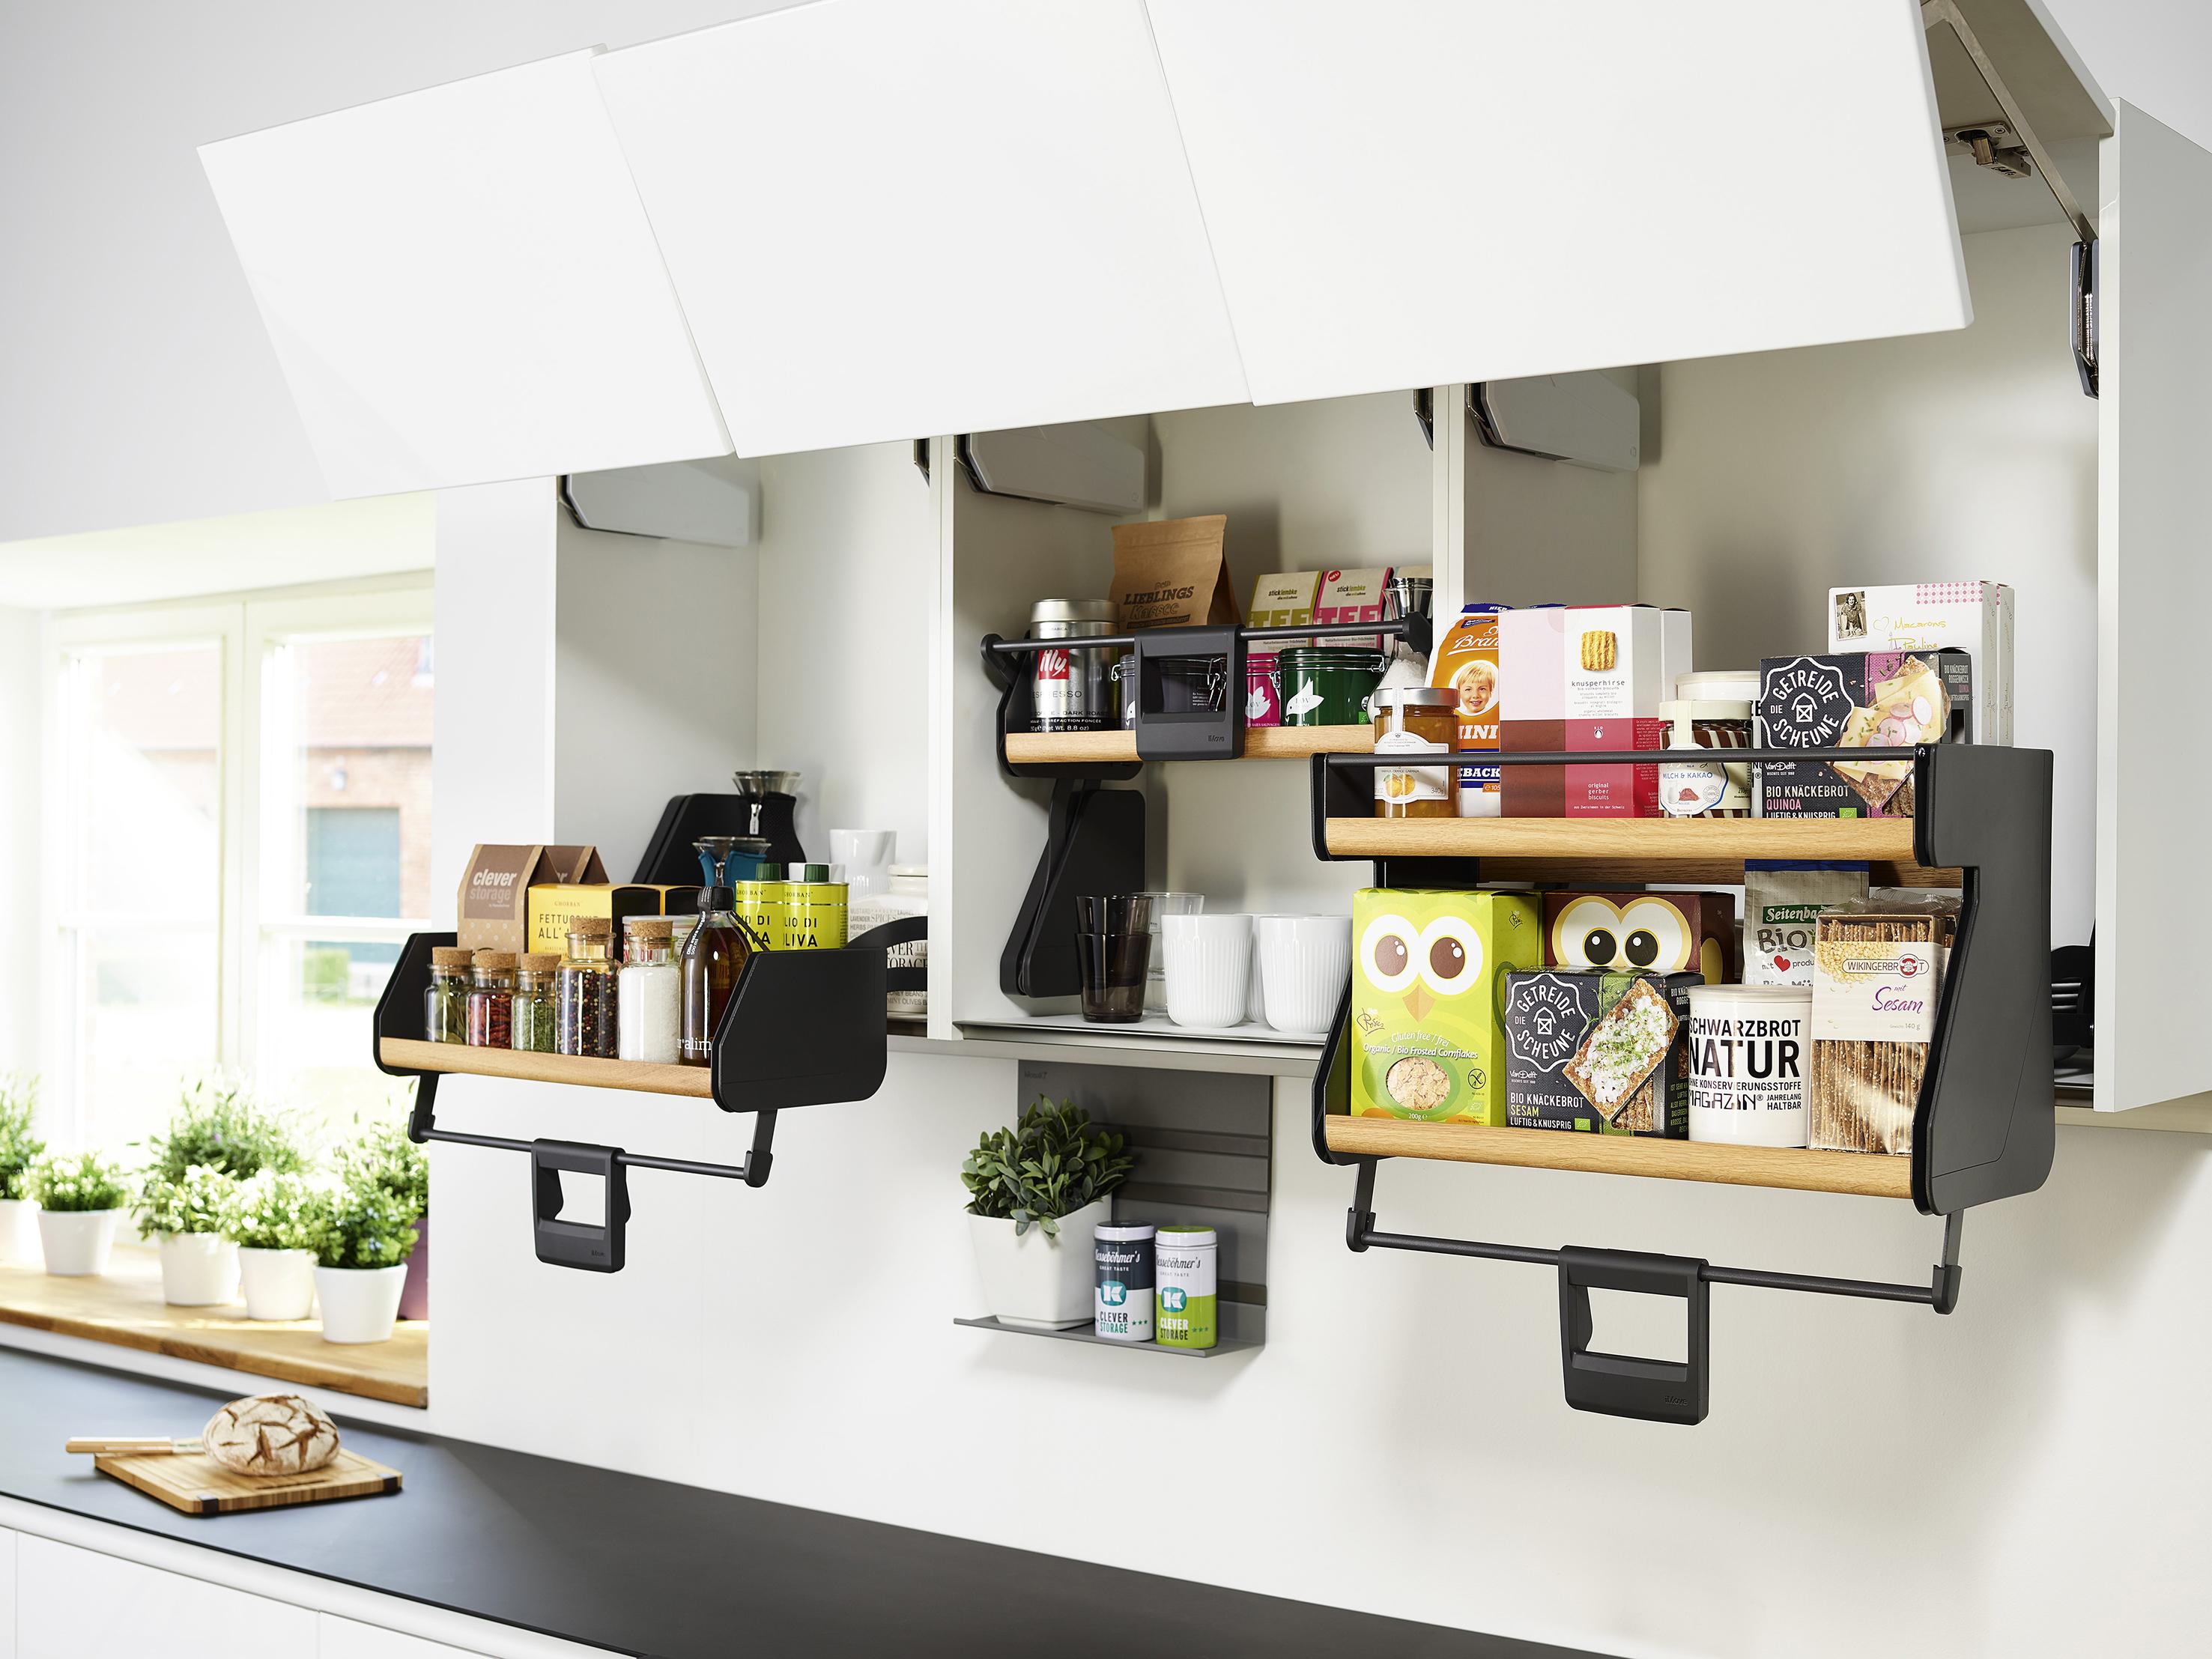 Outdoorküche Mit Spüle Oberschrank : Ikea waschbecken küche outdoorküche mit spüle oberschrank ikea